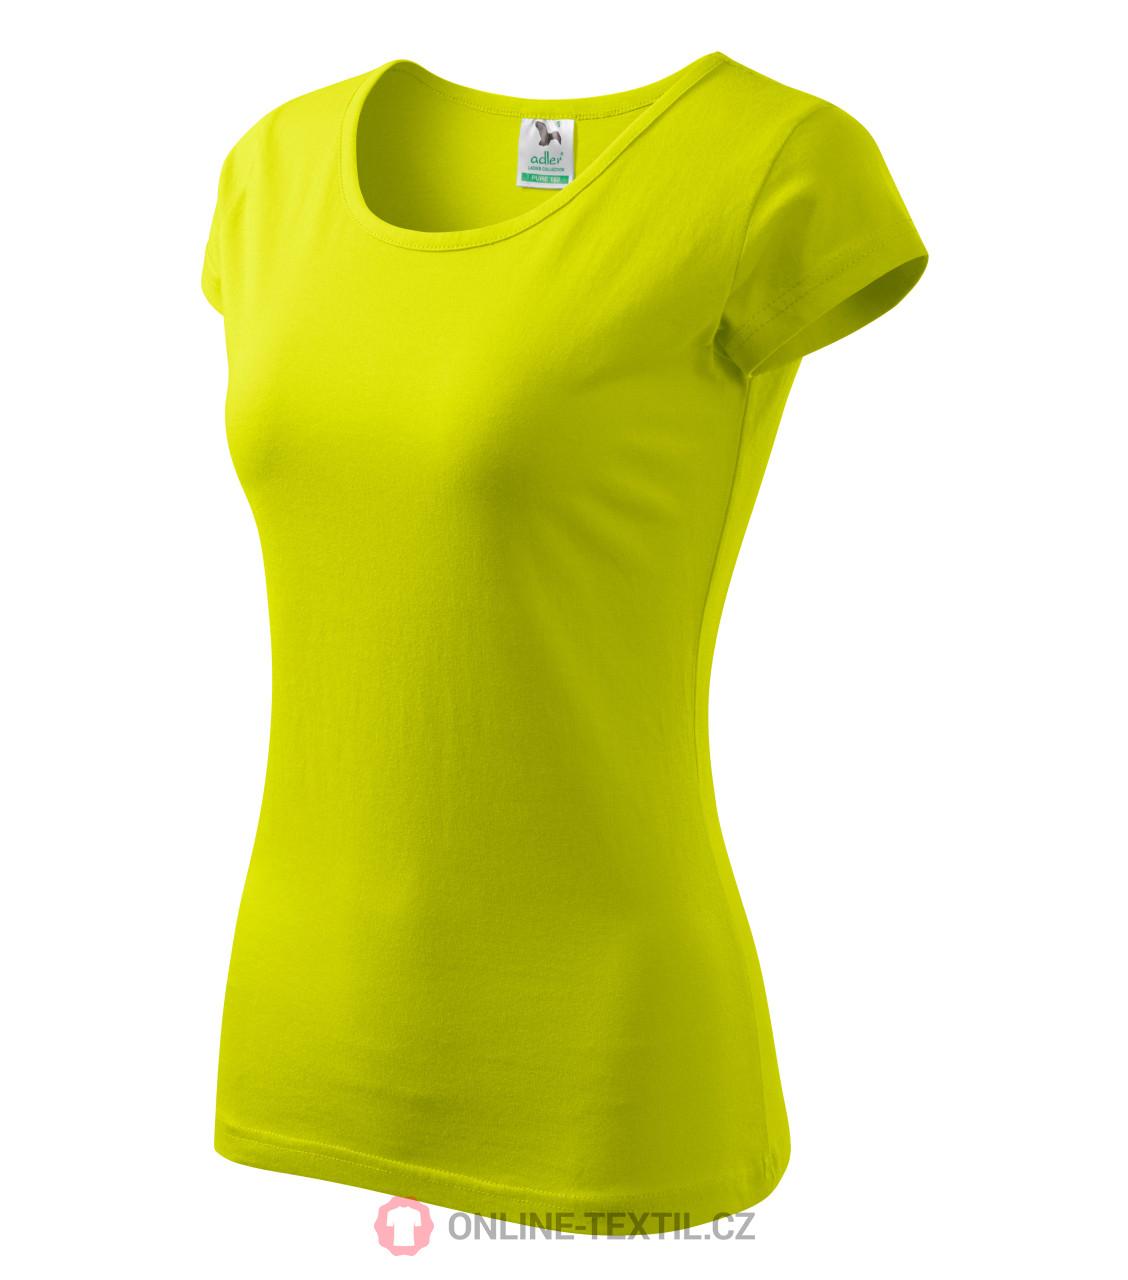 325974859f023 ADLER CZECH Pure tričko dámske A22 - limetková z kolekcie MALFINI ...